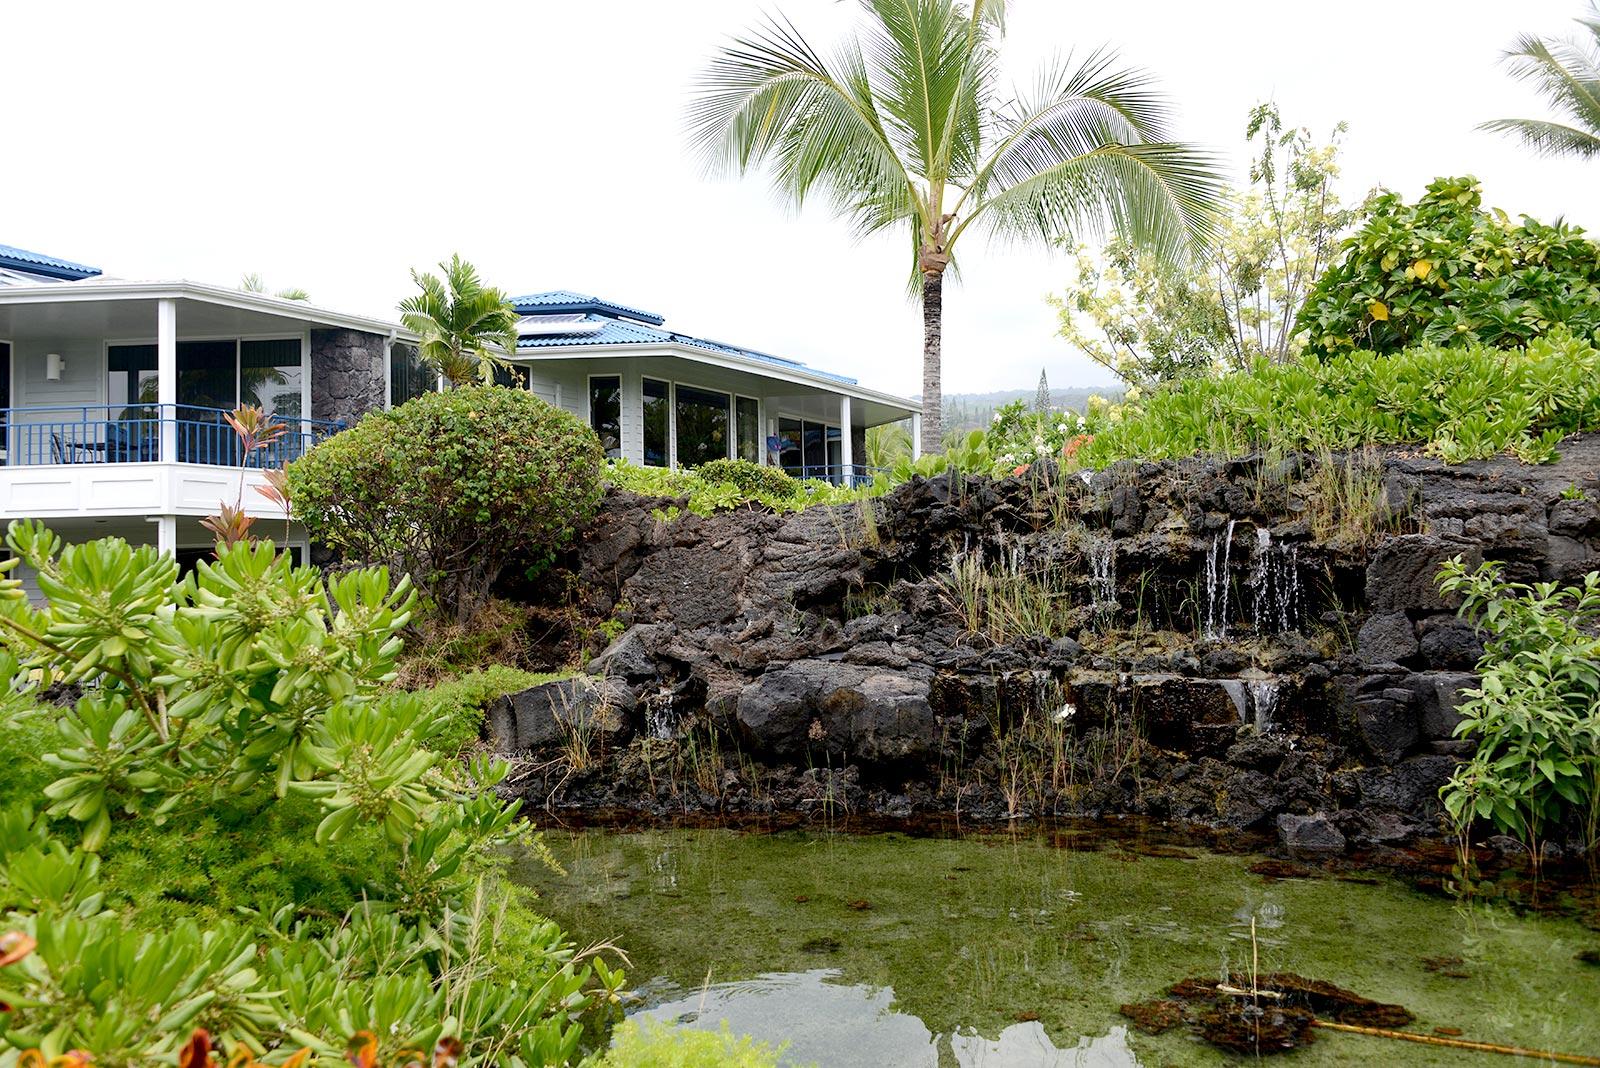 Apartment Mauna Loa 2 Bedrooms 2 Bathrooms photo 16825960